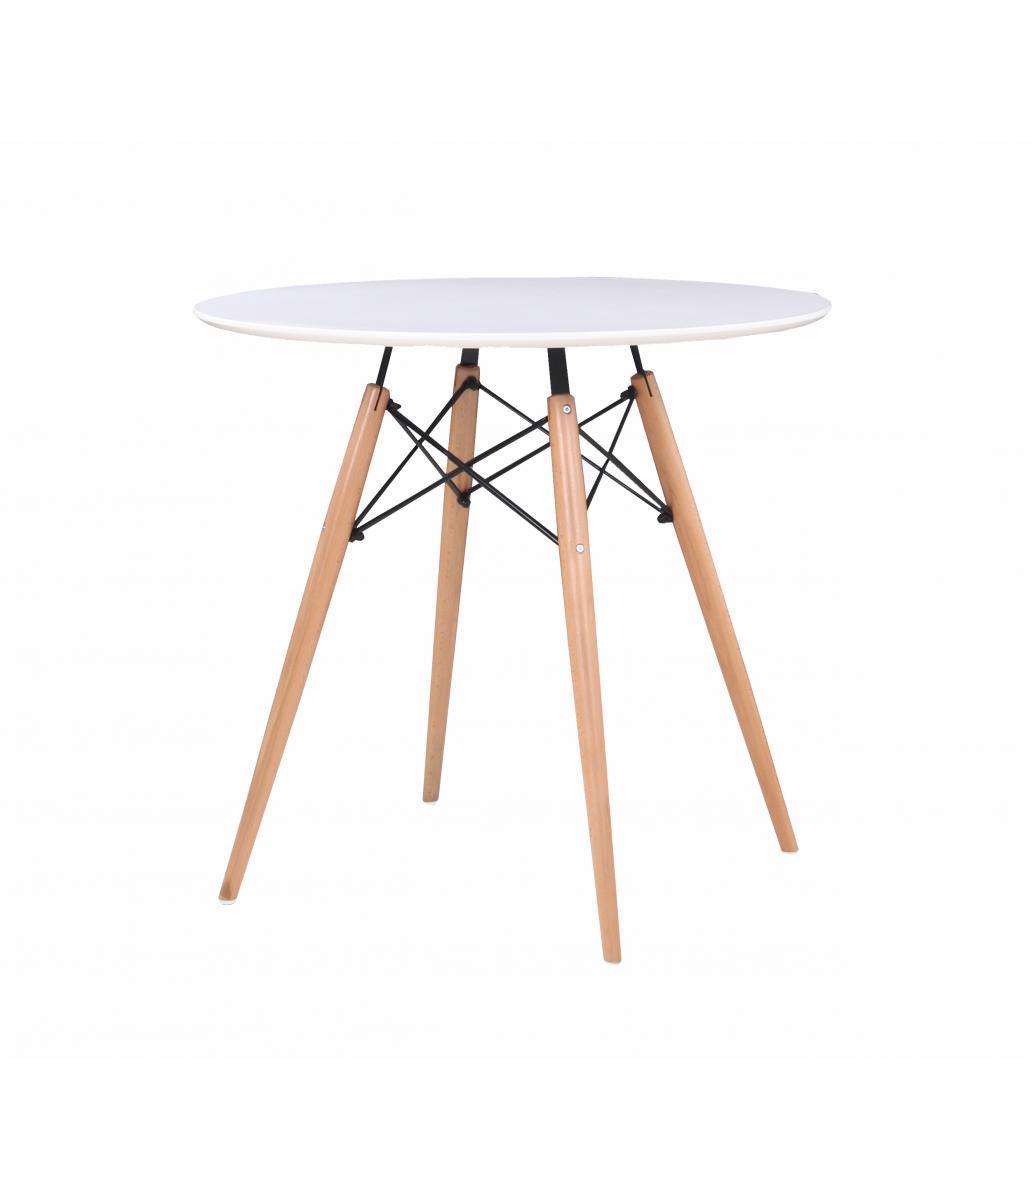 Стол деревянный Eames DSW